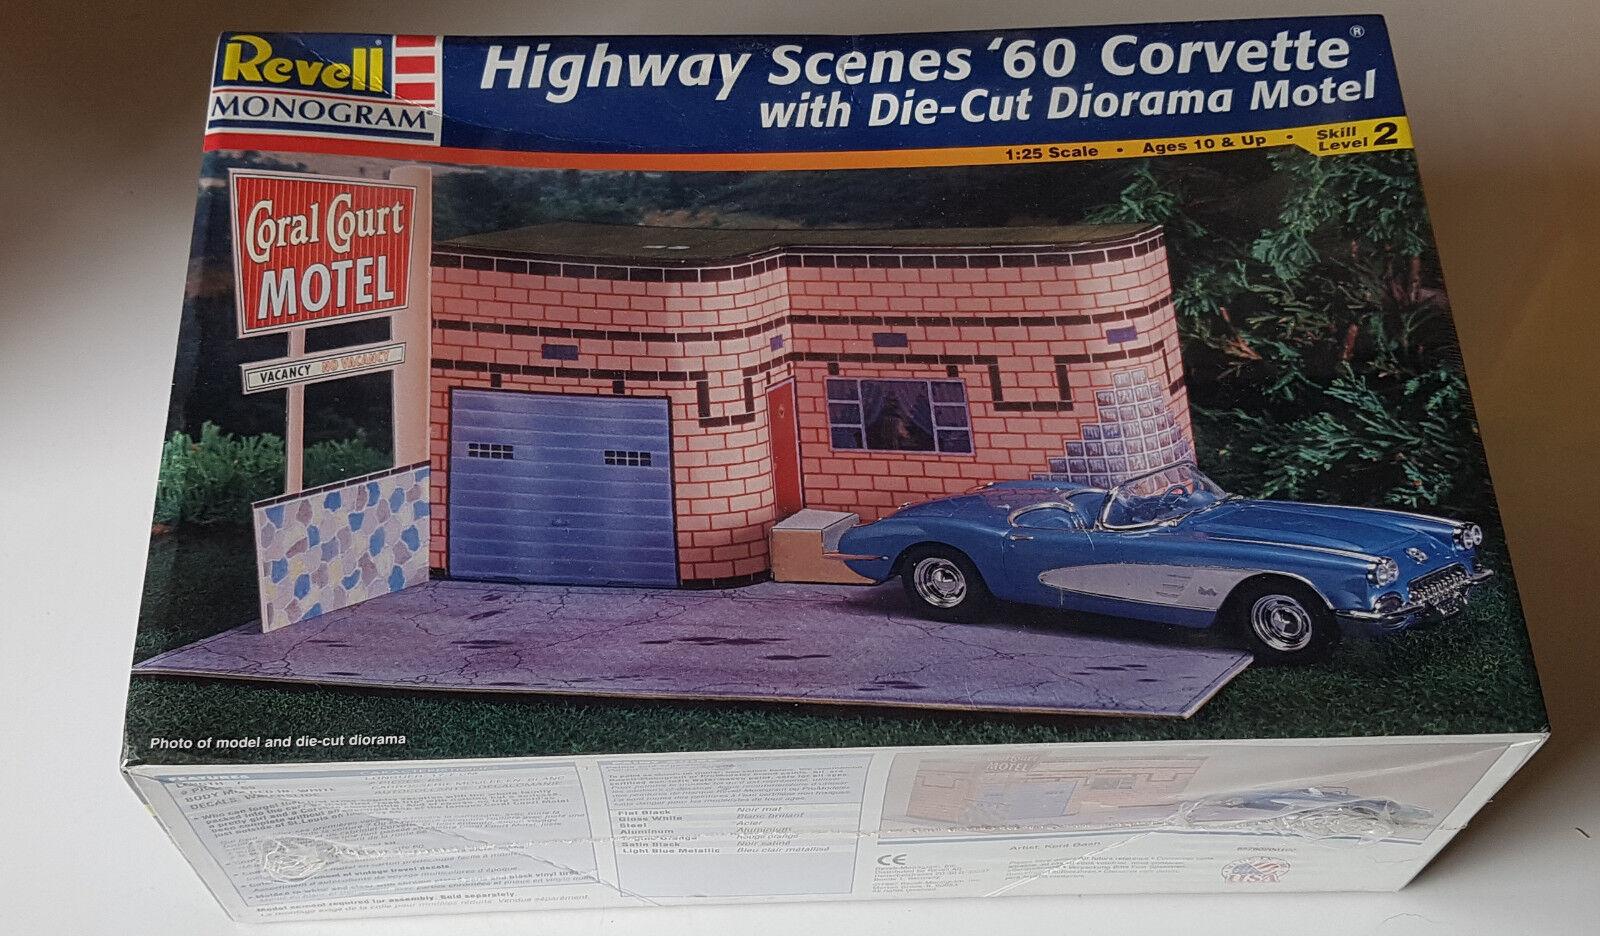 Revell Monogram Highway scenes '60 corvette con diorama, nuevo